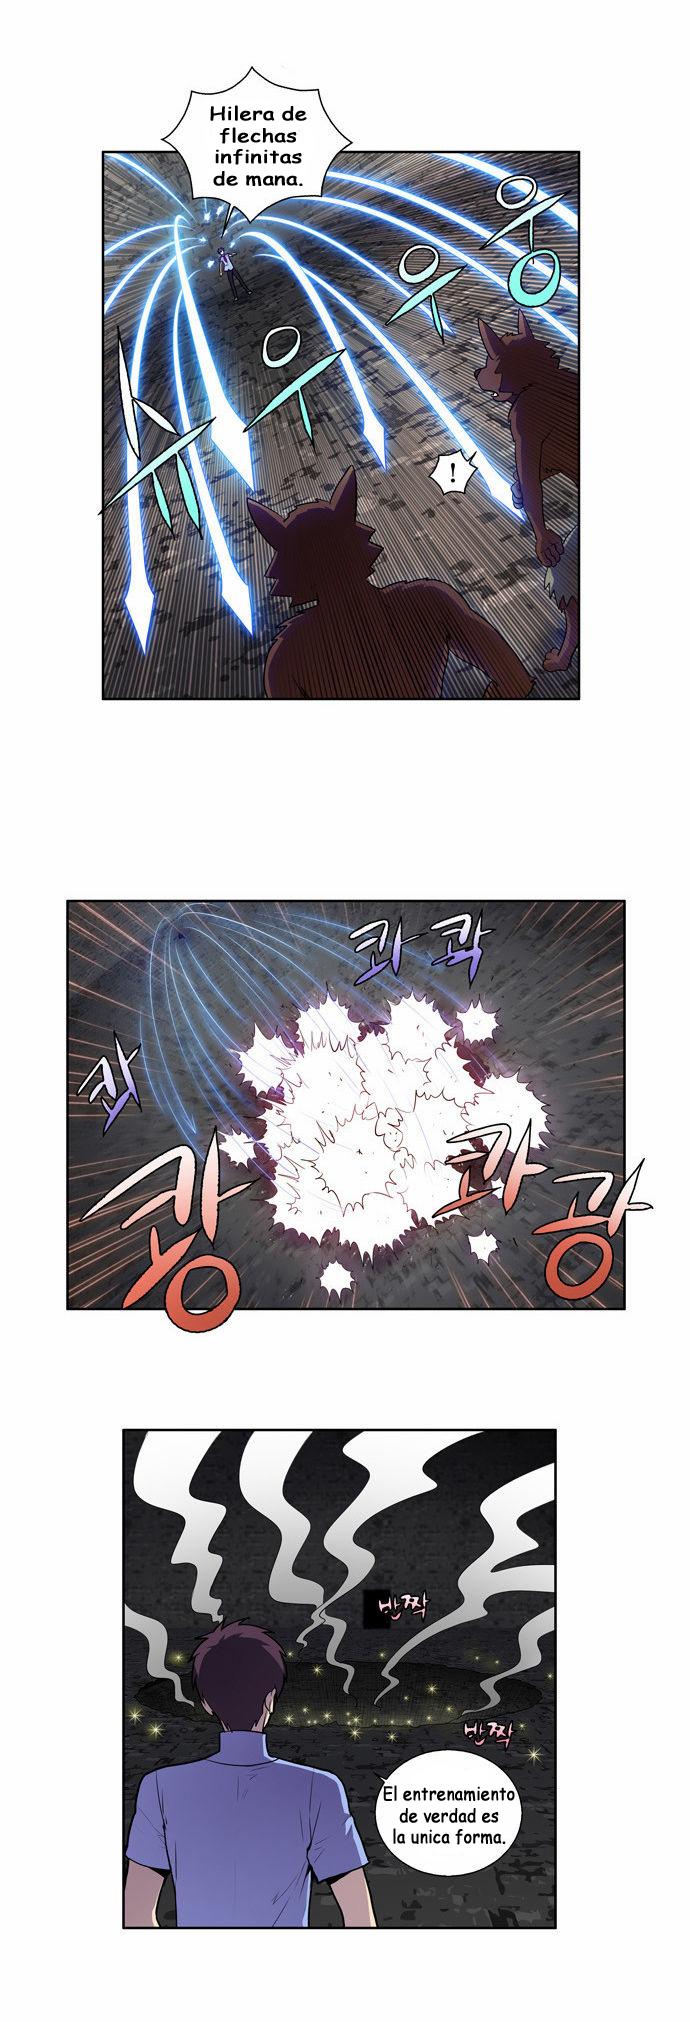 http://c5.ninemanga.com/es_manga/61/1725/396910/7149244de63a0baa9bd91ff165cfaf79.jpg Page 8